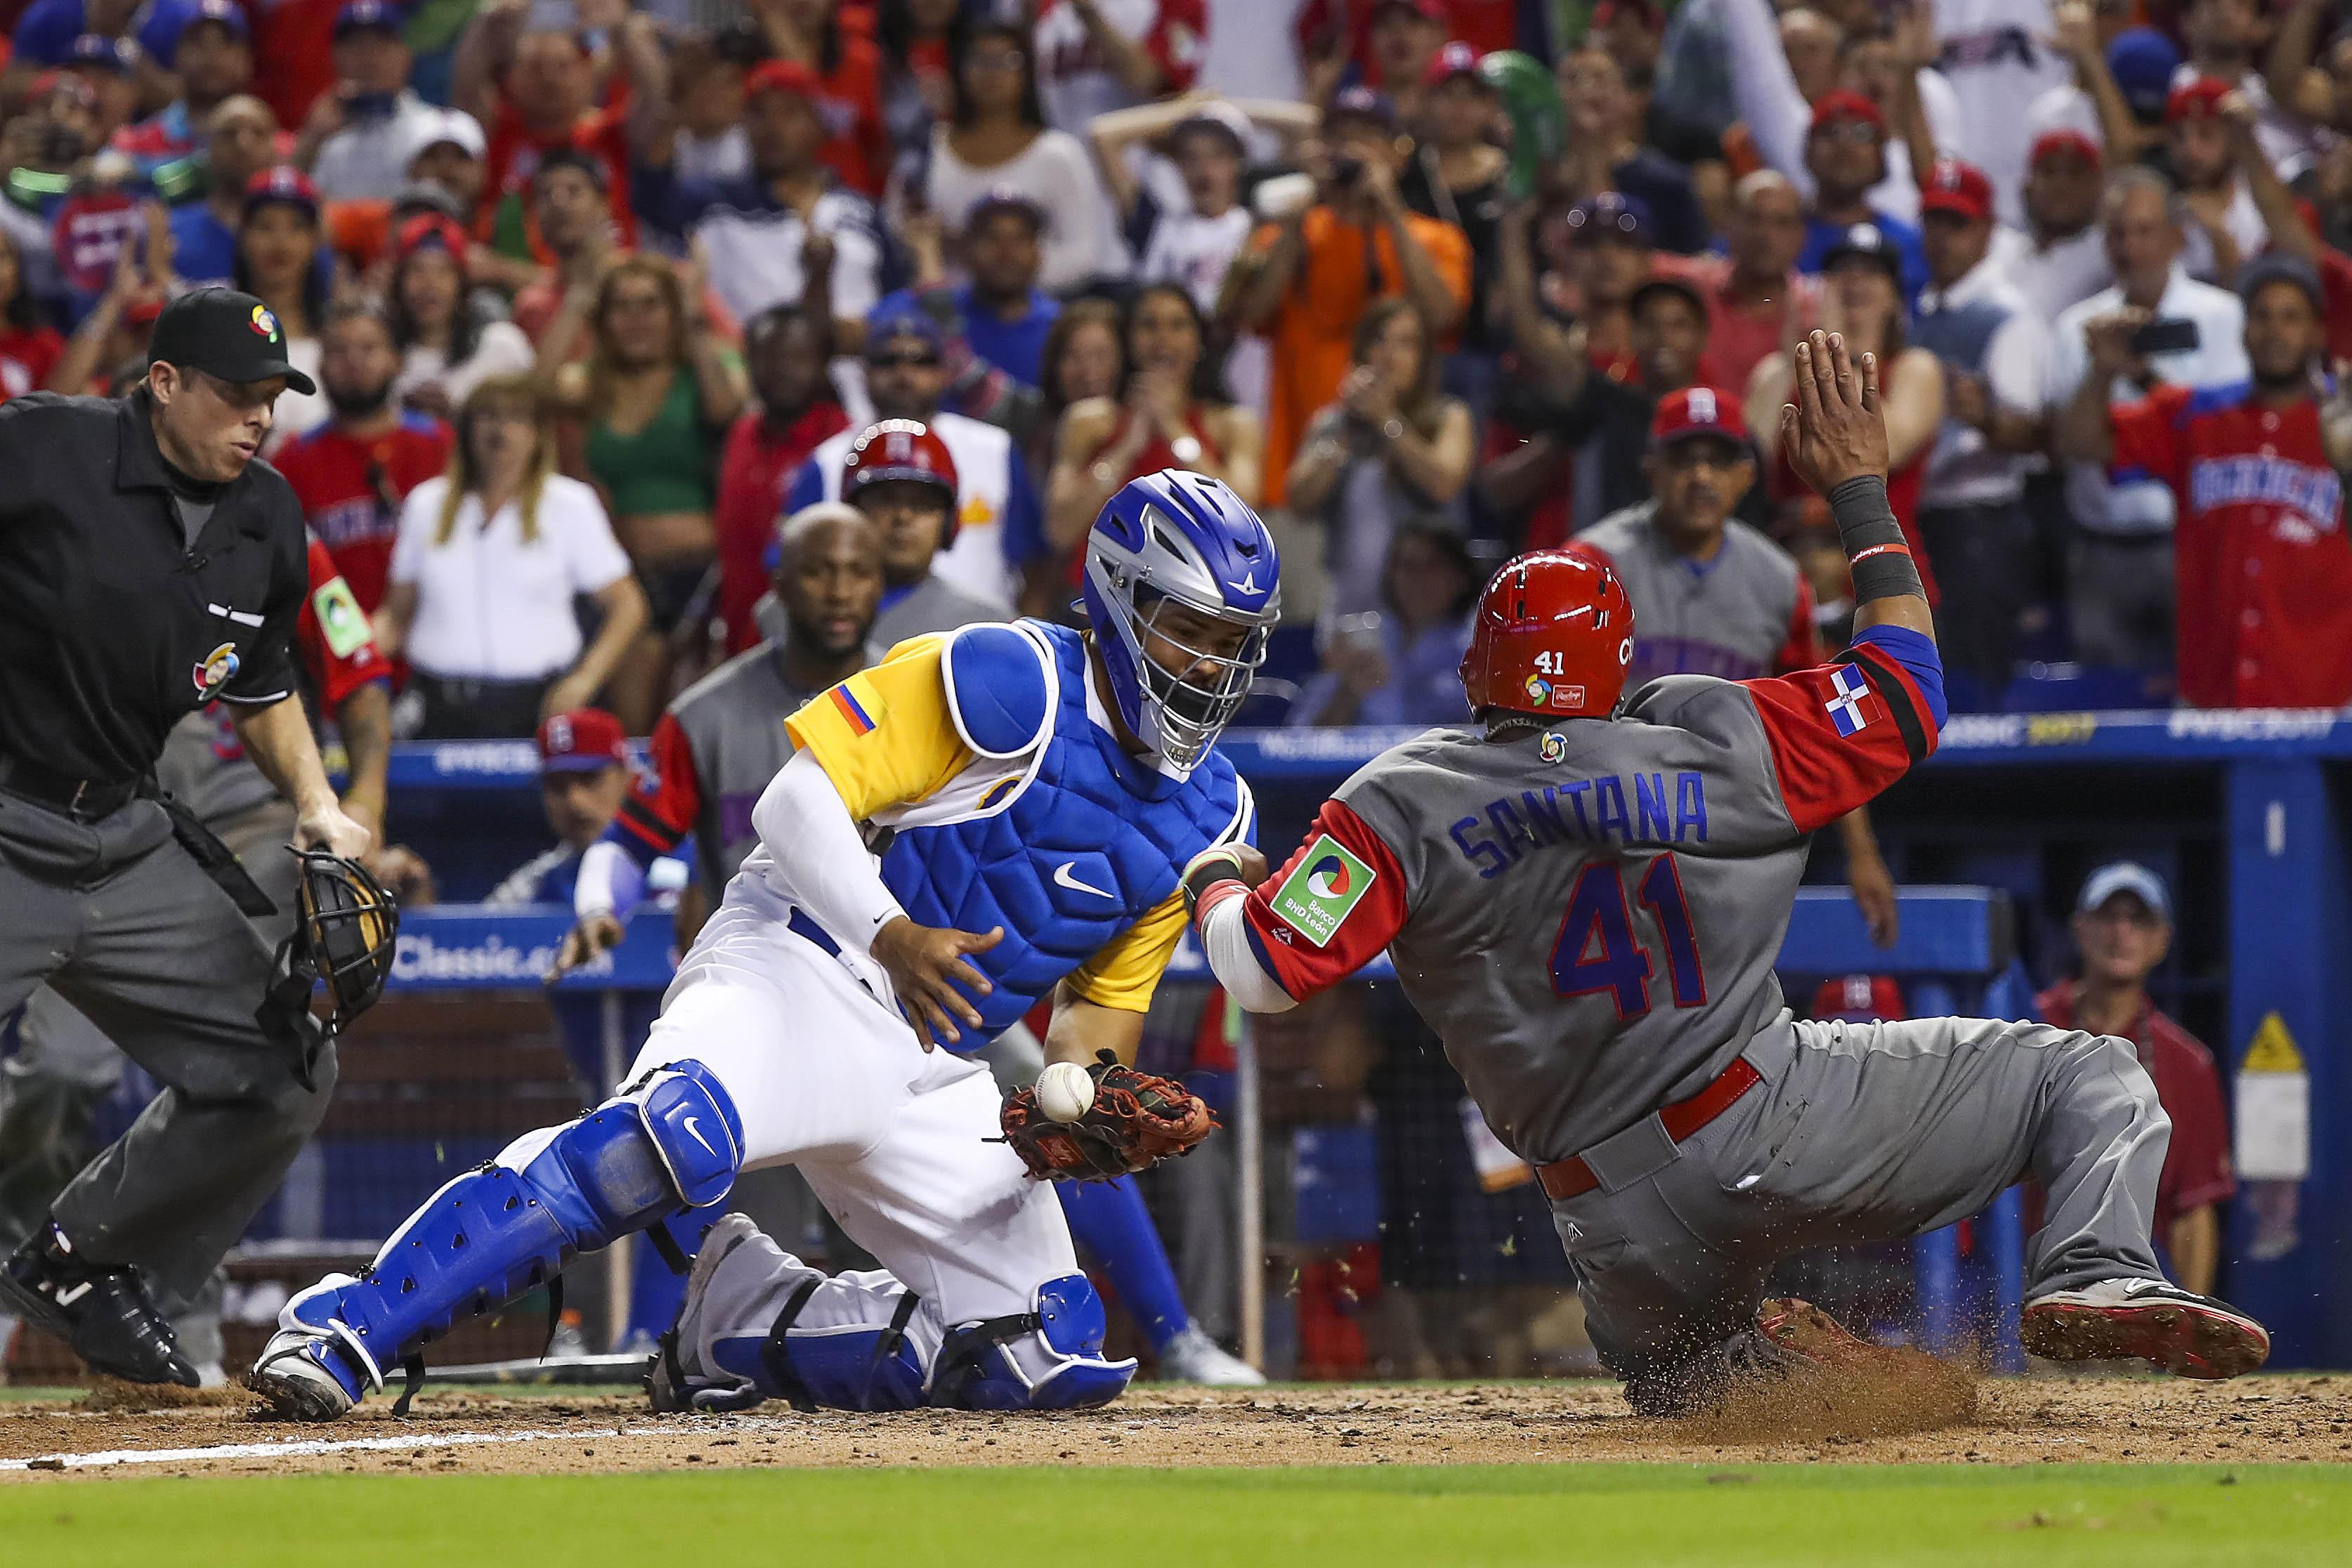 9937985-baseball-world-baseball-classic-dominican-republic-at-colombia